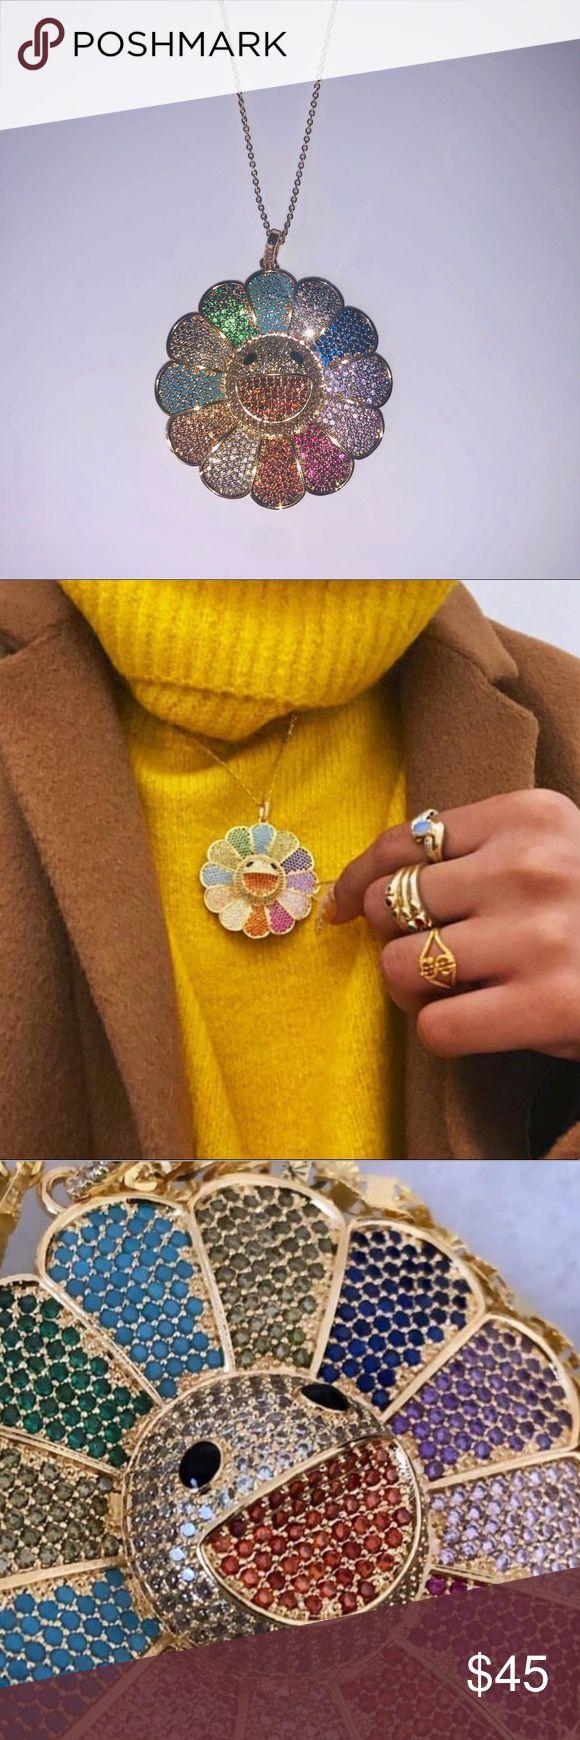 Takashi Murakami Flower Necklace Murakami flower necklace